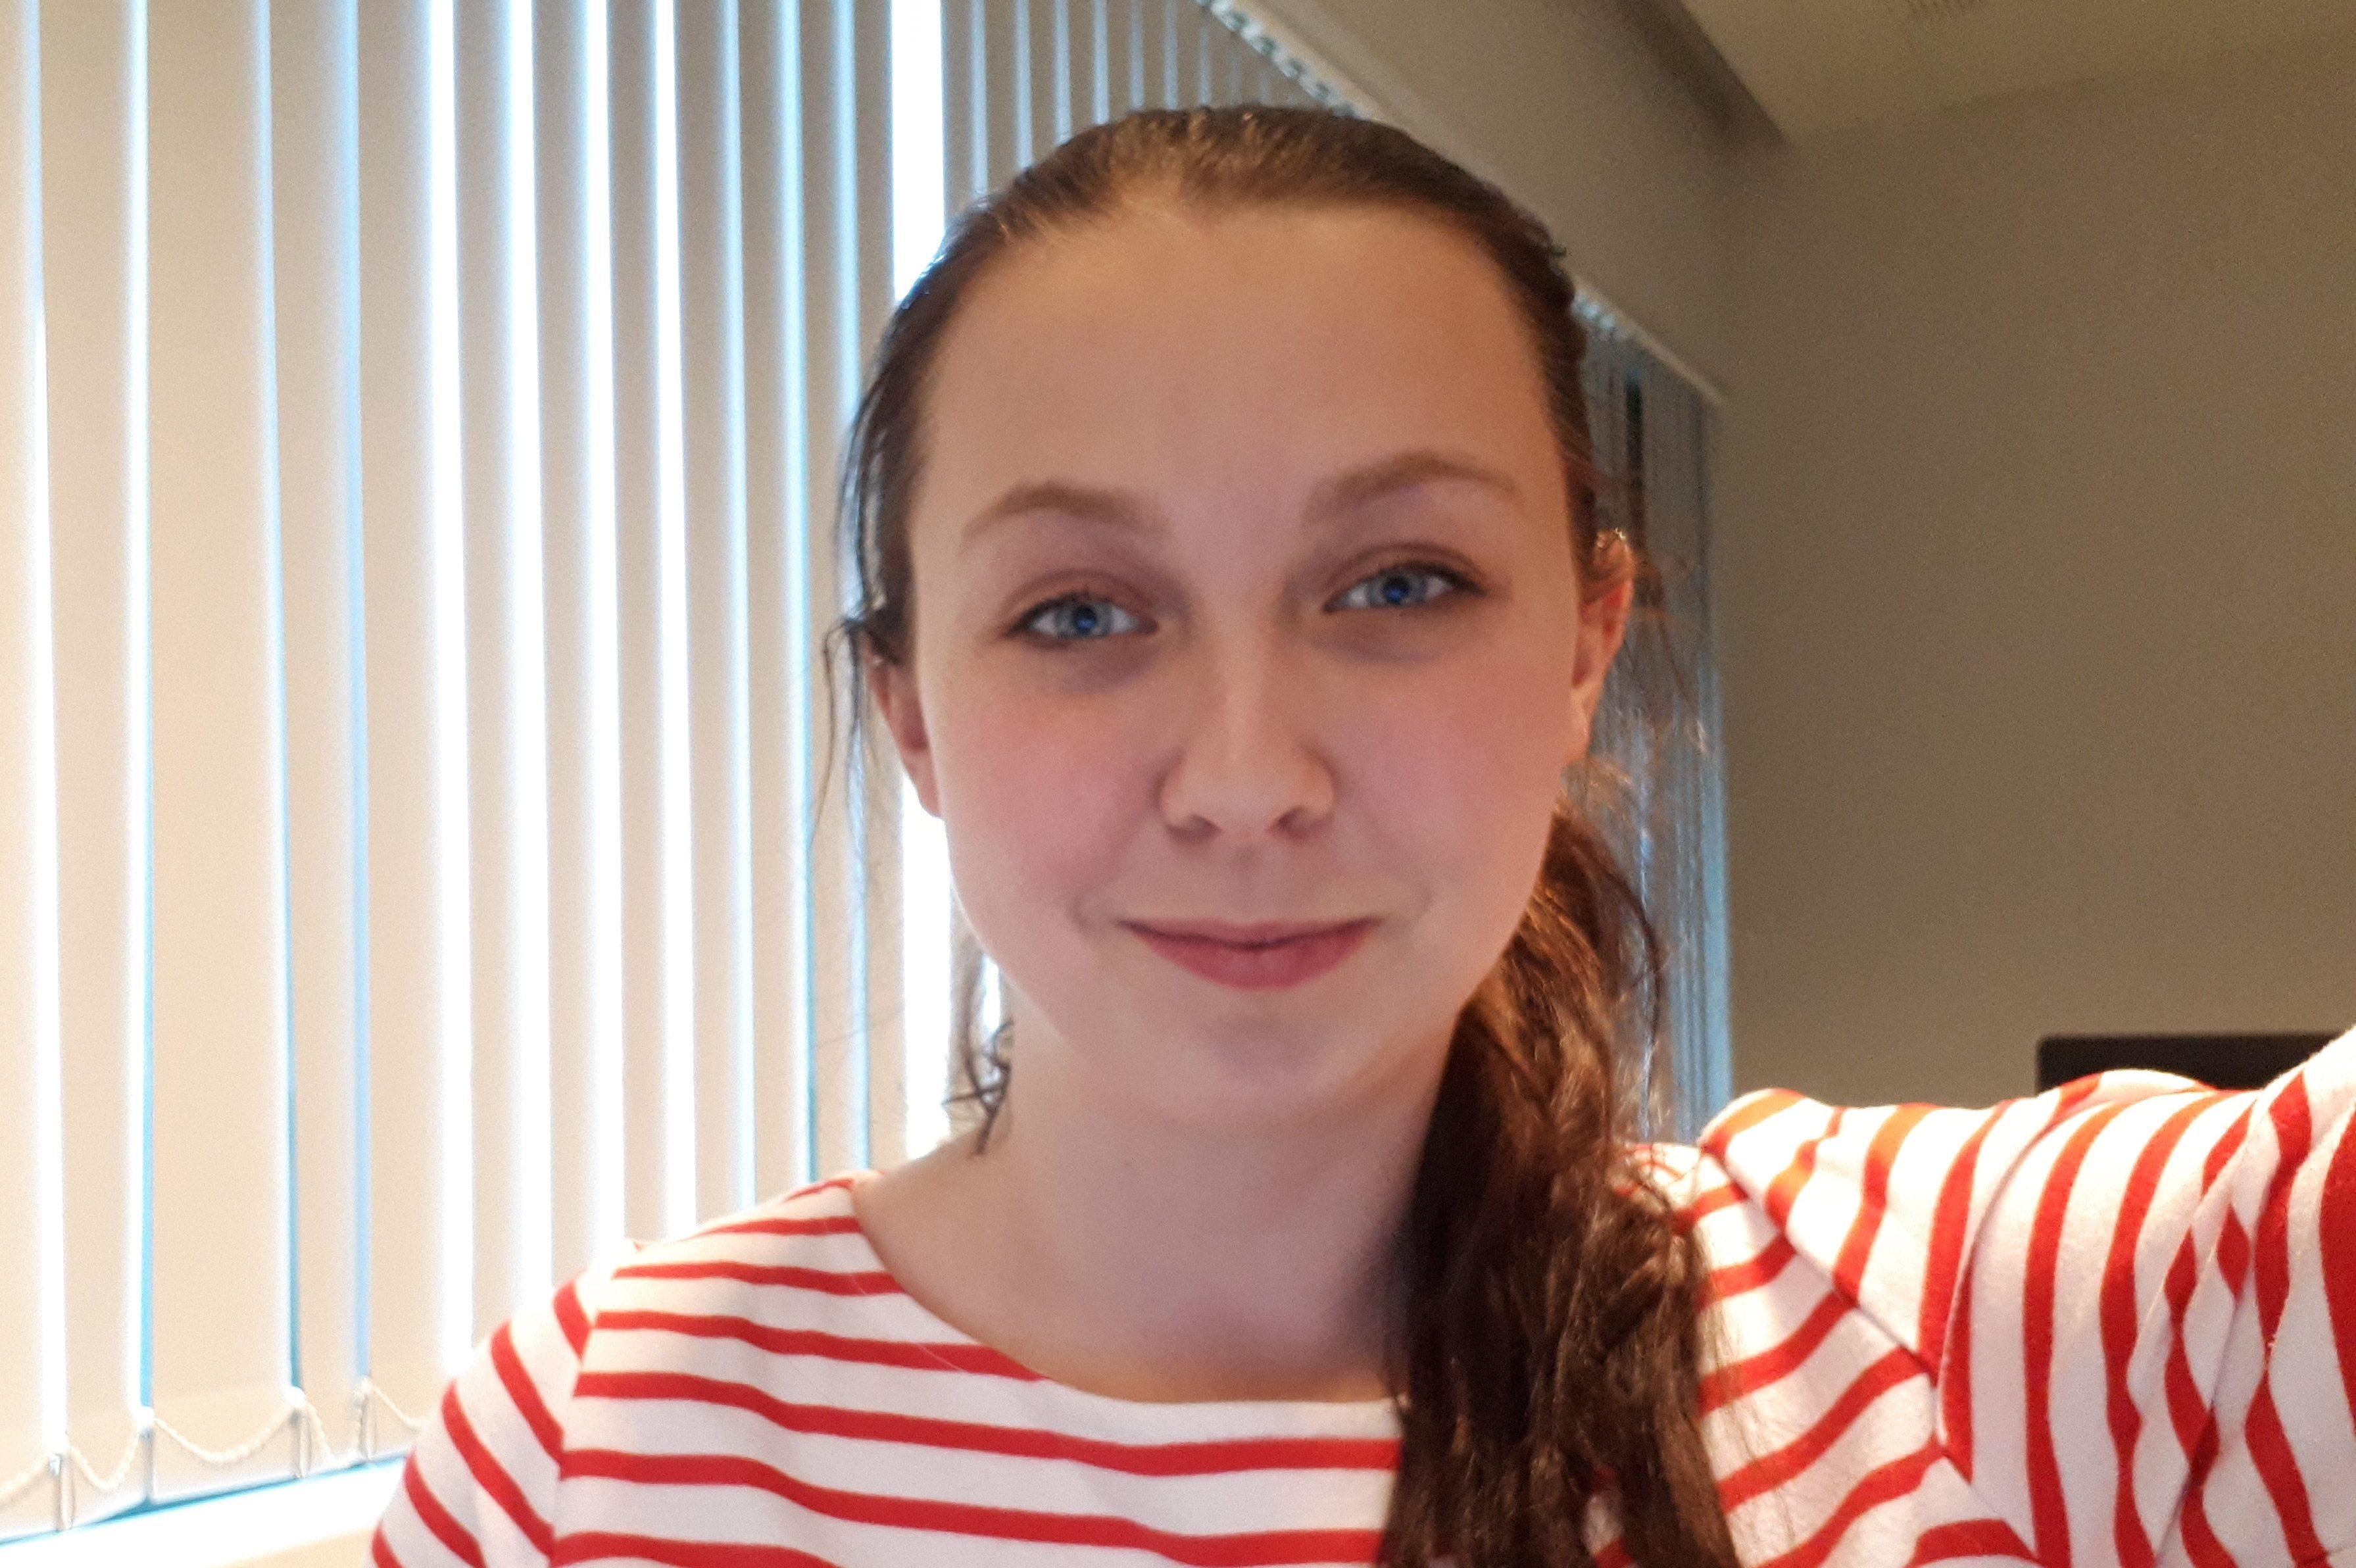 headshot of Katrin from Iceland